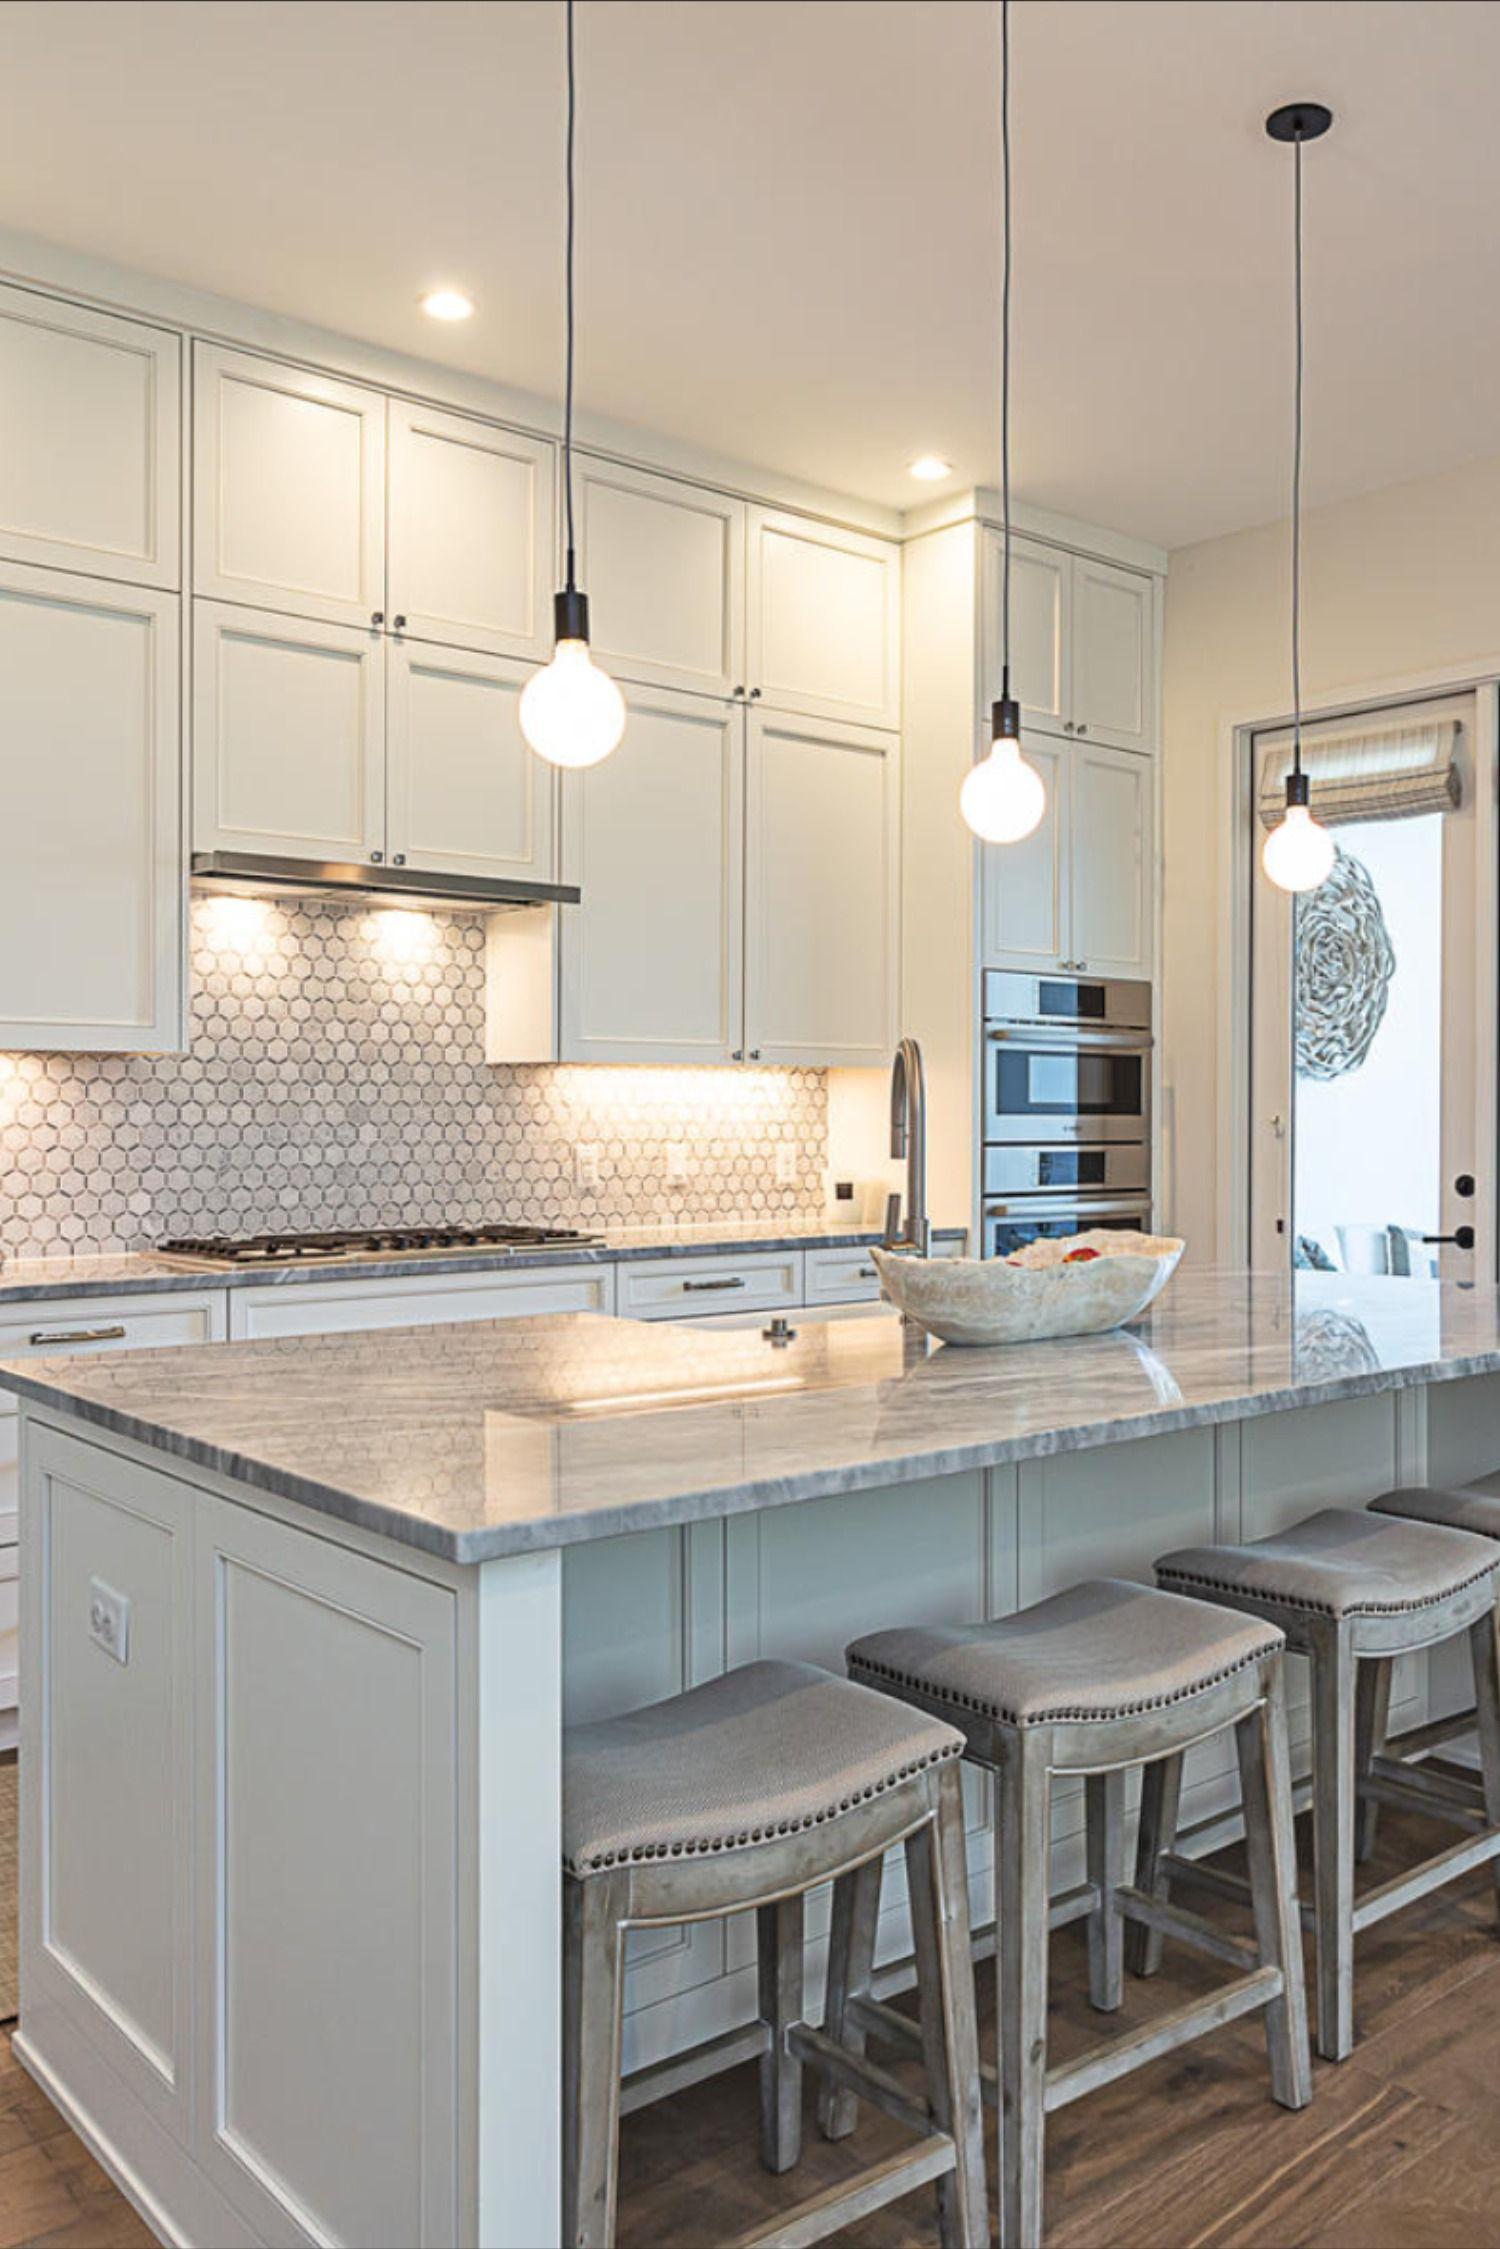 Elegant Kitchen With Lovely Island Austin Texas Homes In 2020 Elegant Kitchens Home Home Decor